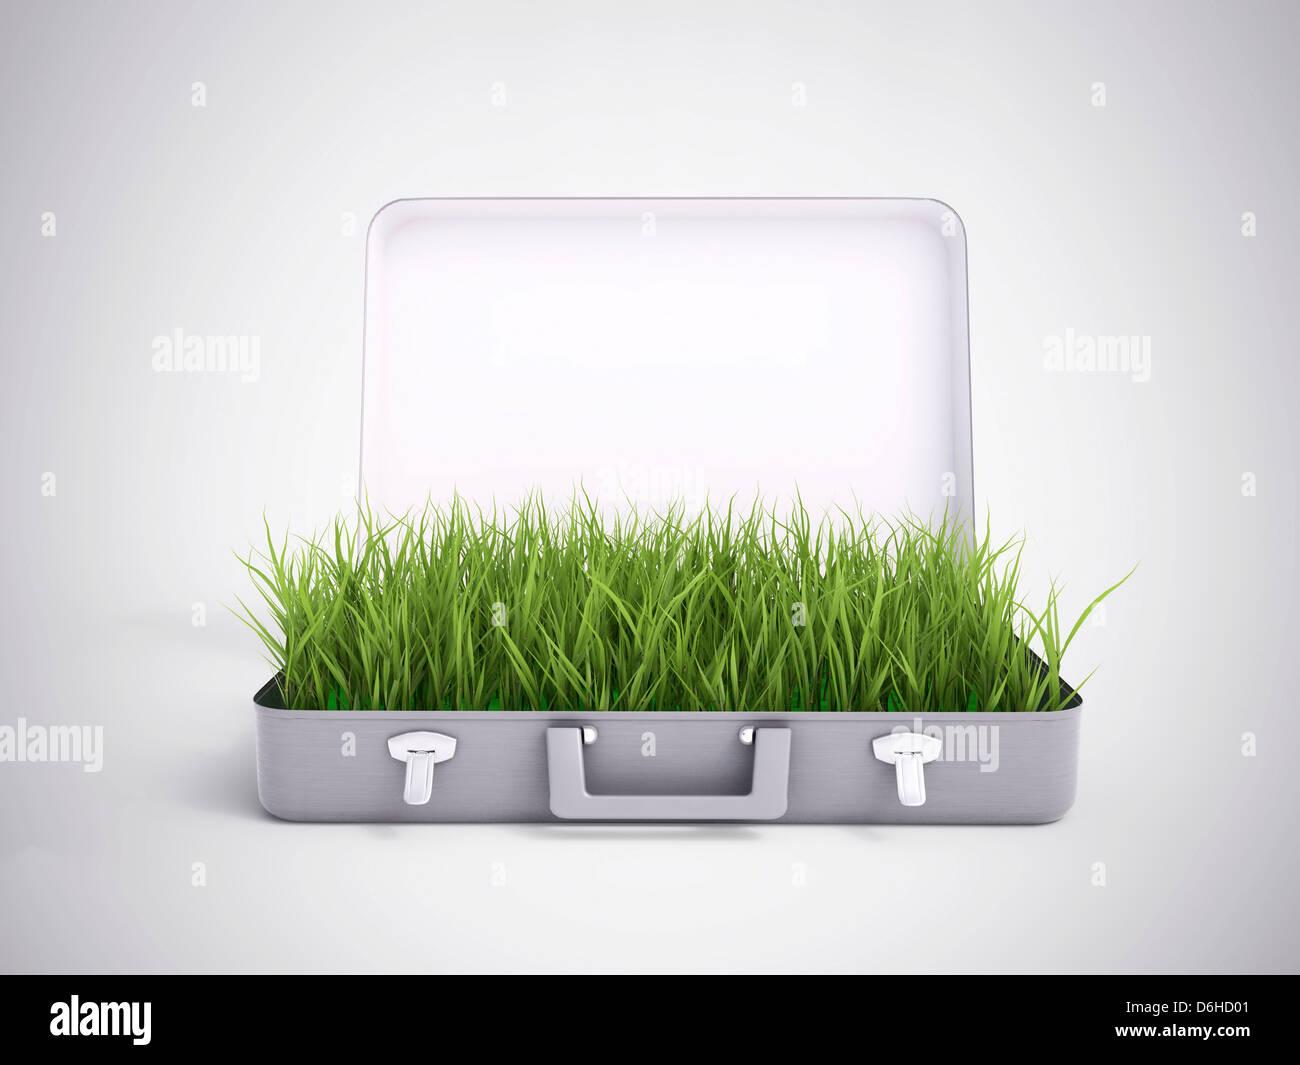 Grüne Investitionen, konzeptuellen Kunstwerk Stockbild